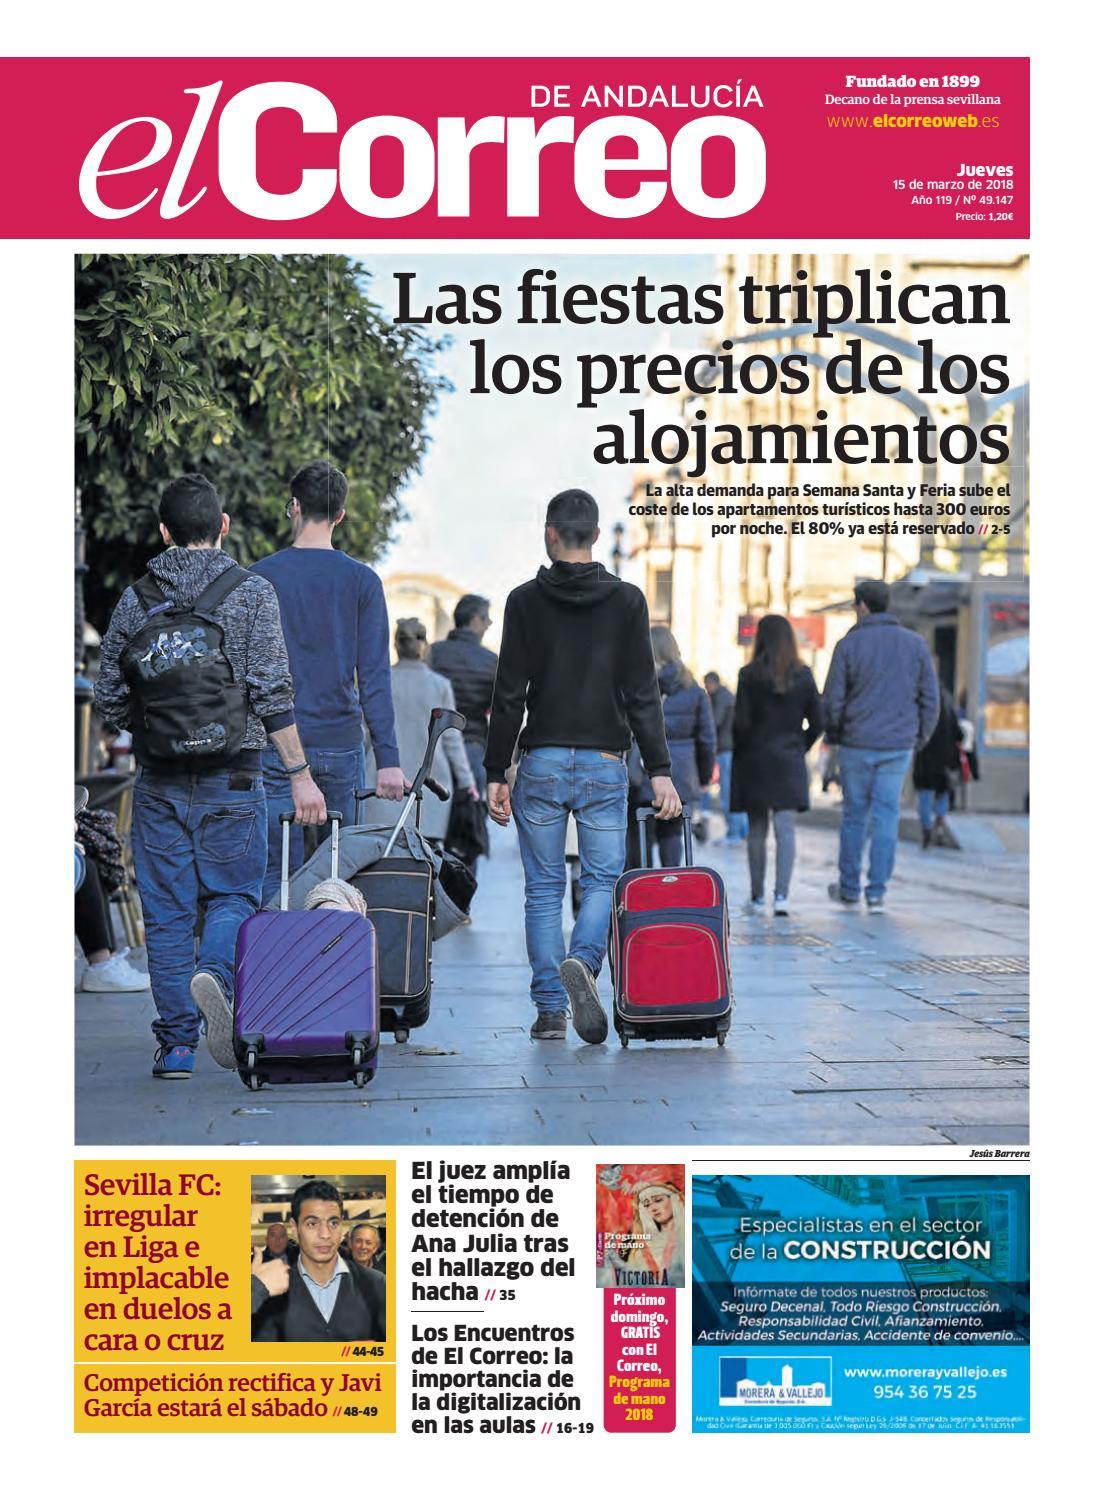 half off d9200 293b9 15.03.2018 El Correo de Andalucía by EL CORREO DE ANDALUCÍA S.L. - issuu